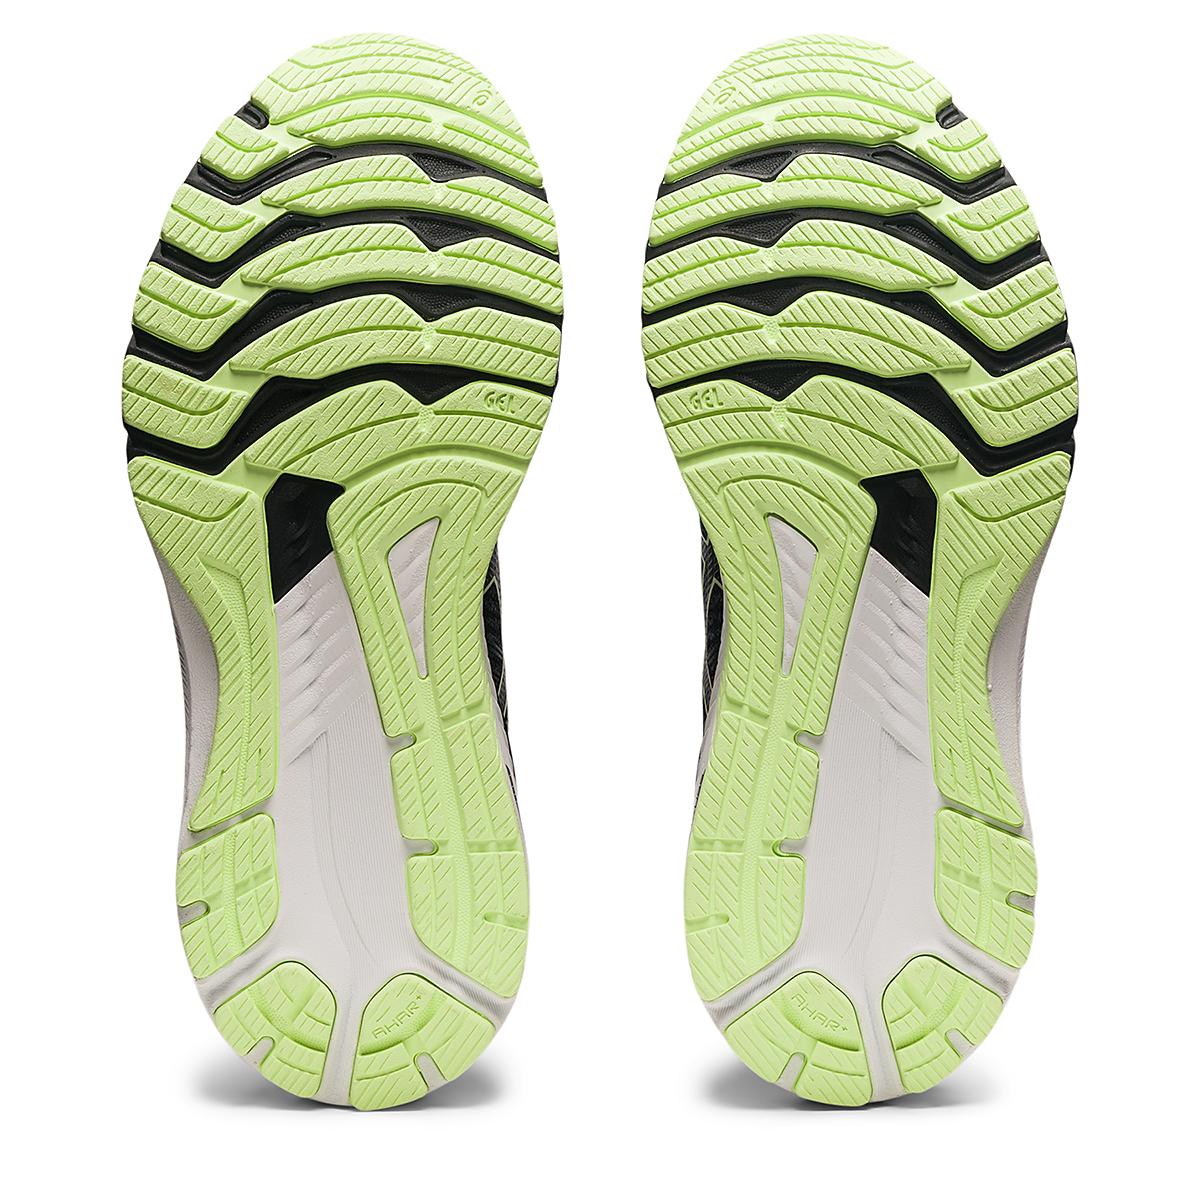 Women's Asics GT-2000 10 Running Shoe - Color: Soft Lavender/Black - Size: 5 - Width: Wide, Soft Lavender/Black, large, image 7